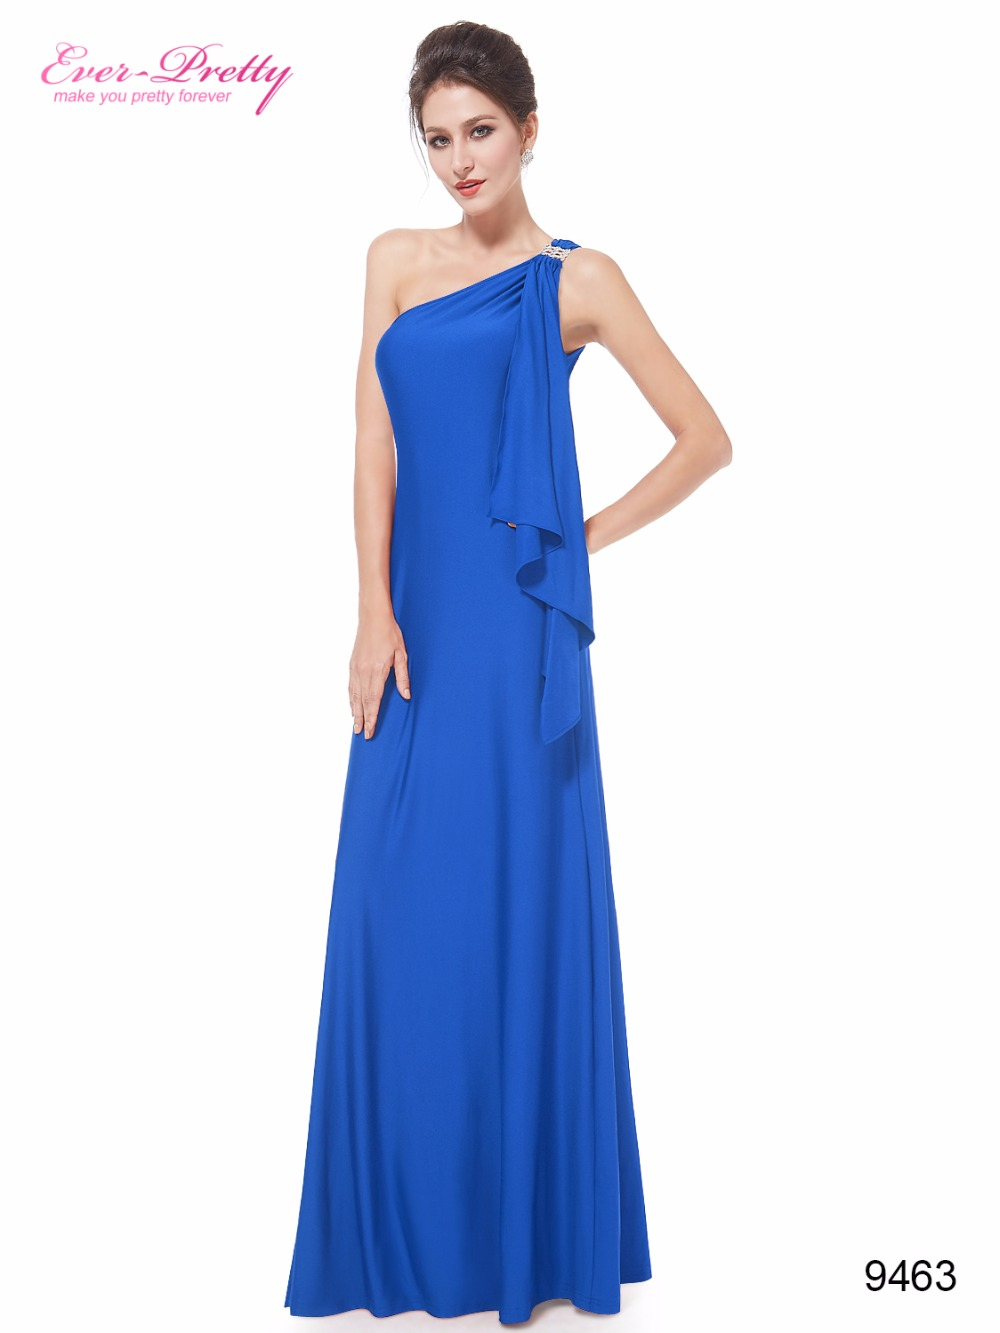 evening dresses shipping worldwide